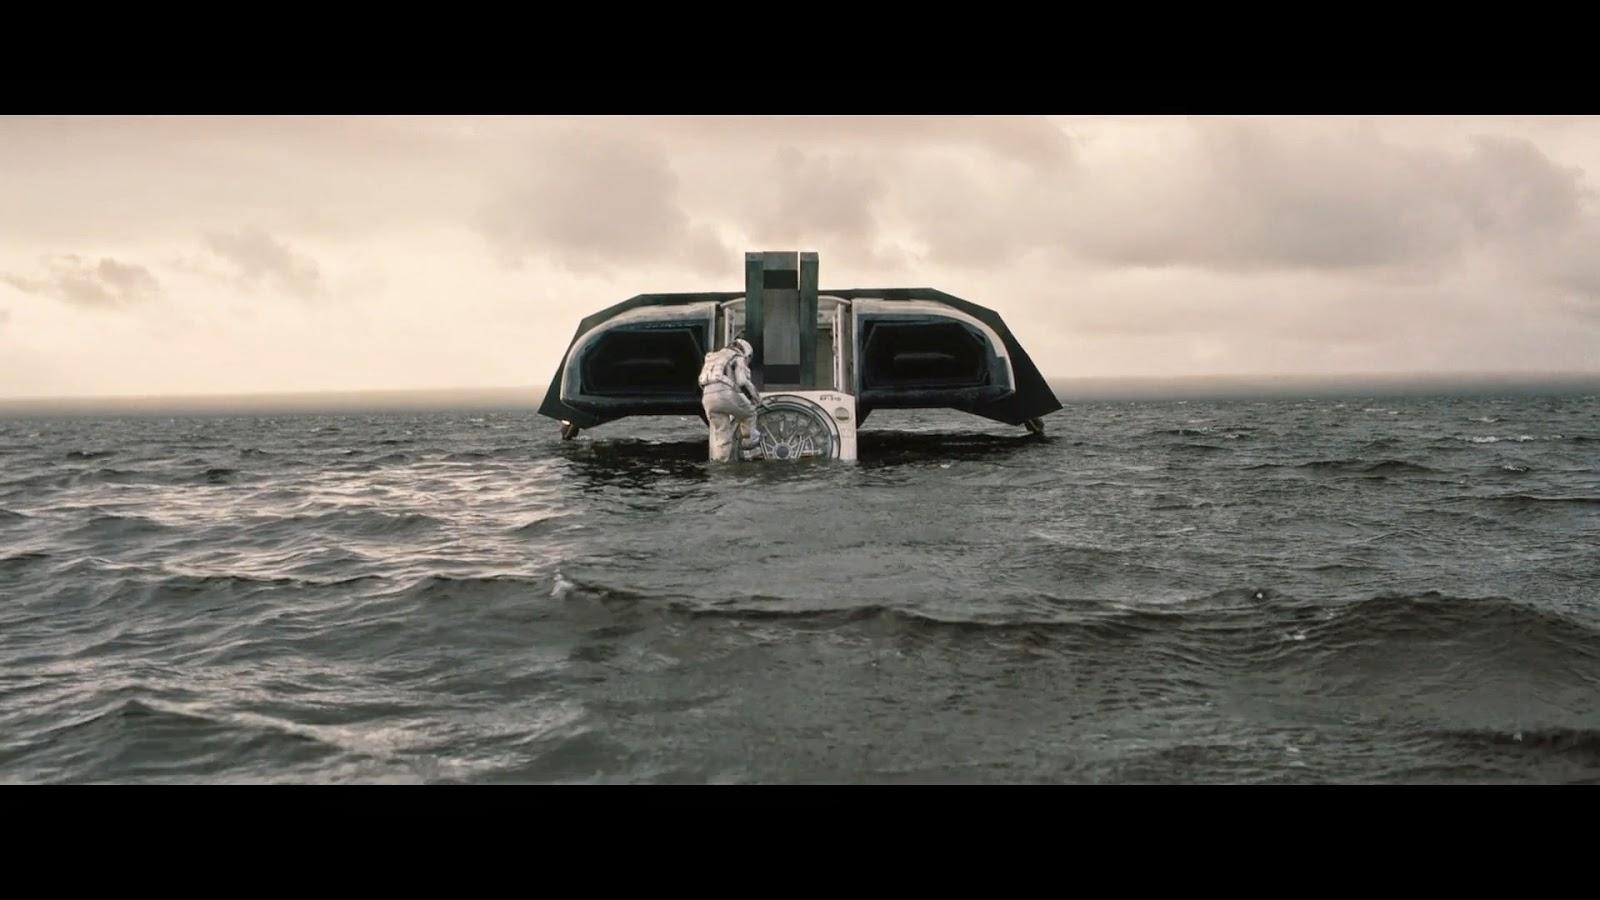 Interstellar (2014) 1080p